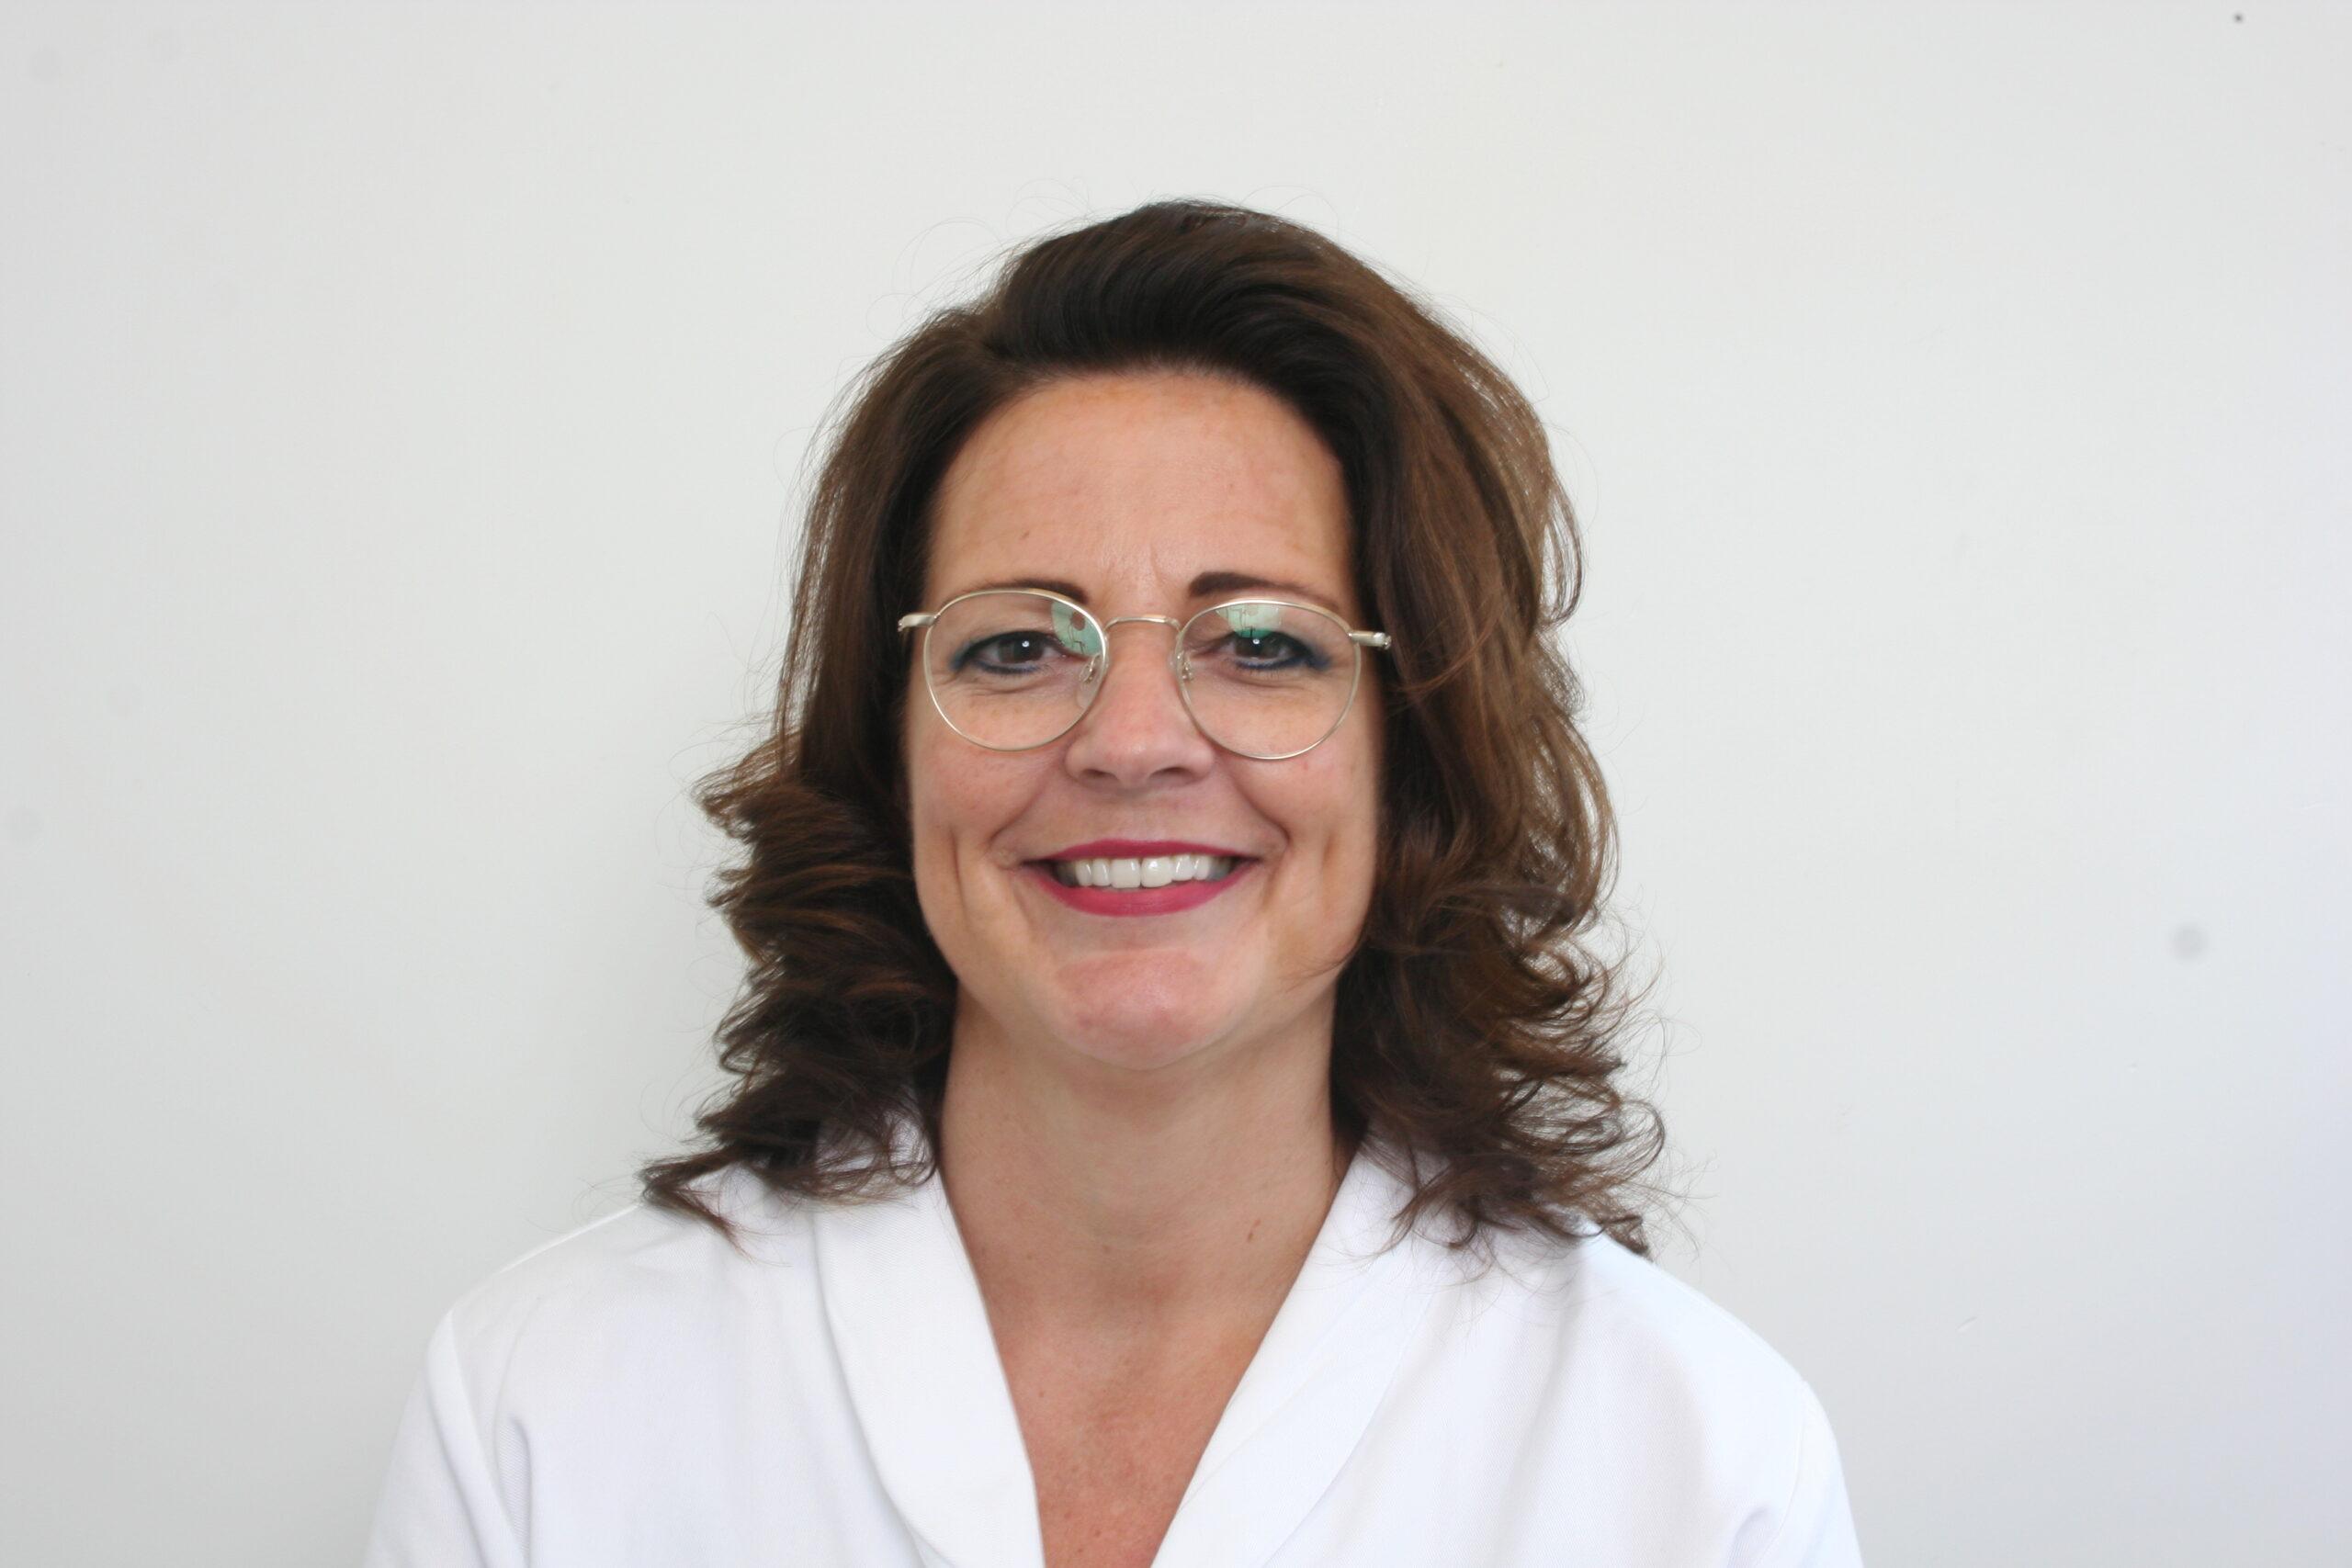 Karin Schepers